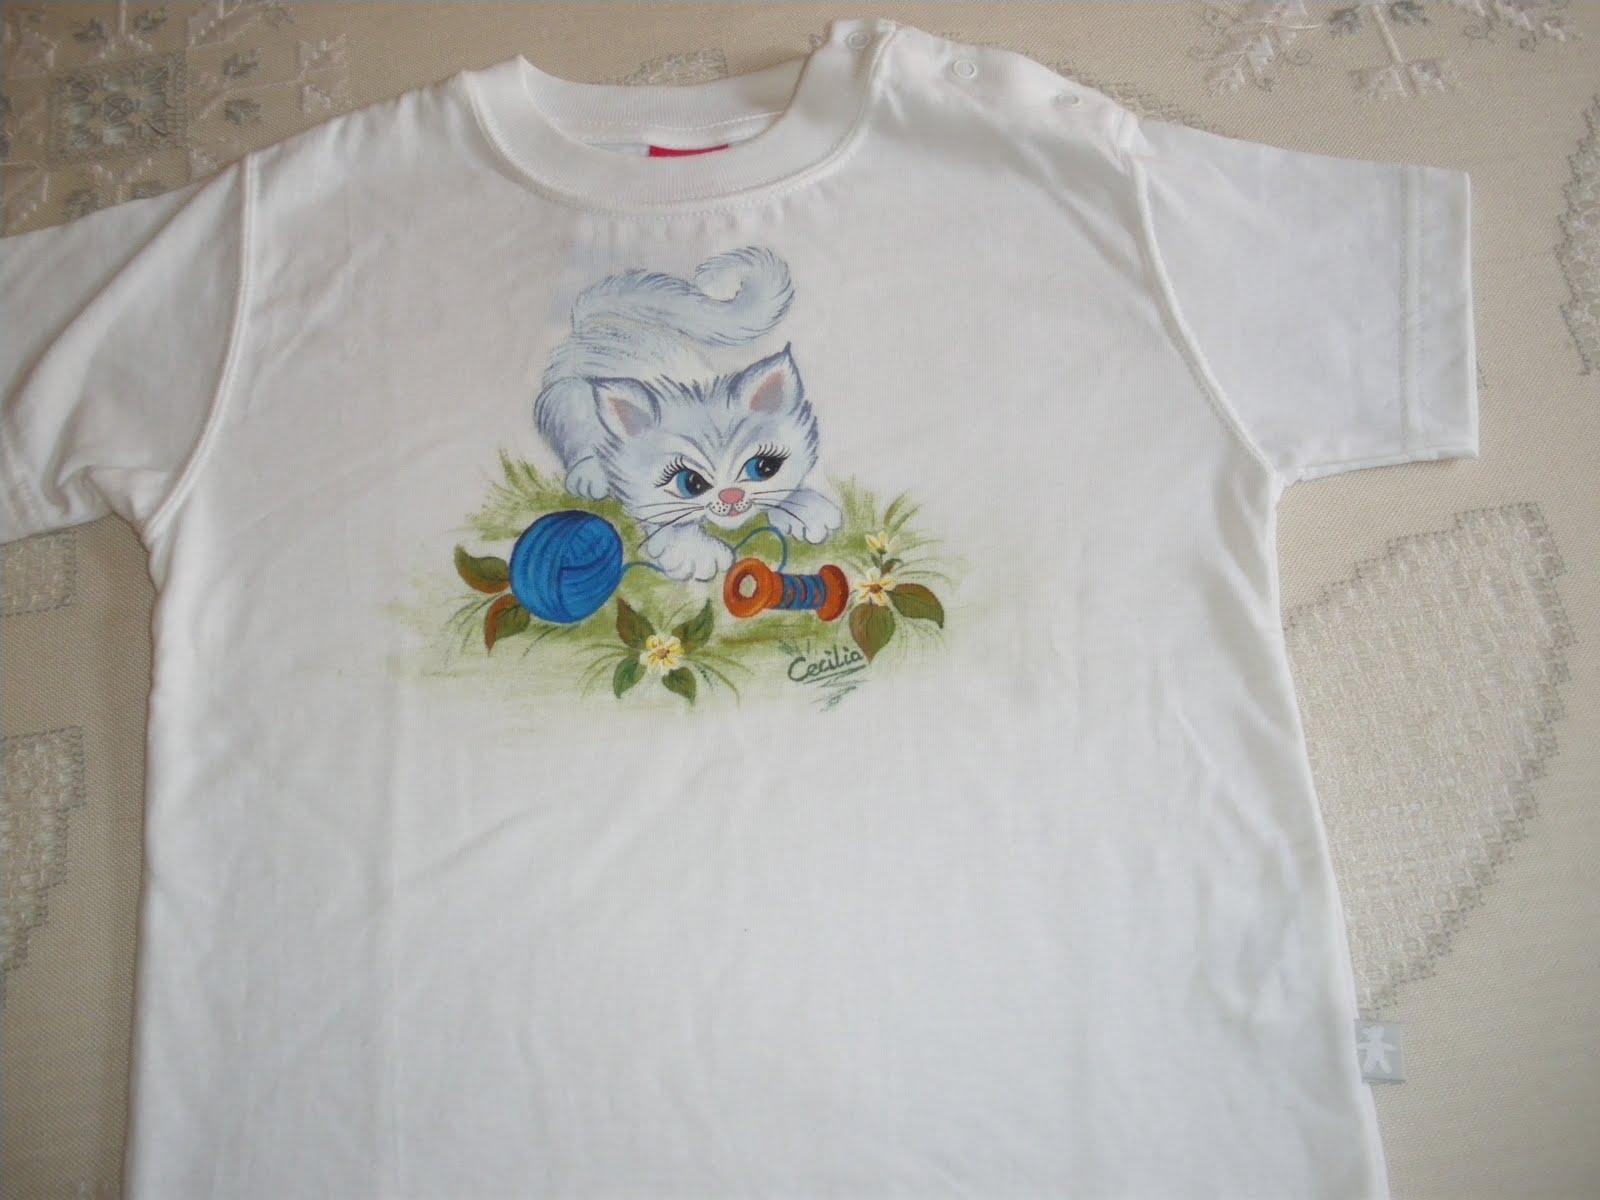 Artesania pintura en tela y manualidades camiseta de ni o - Pinturas para pintar camisetas ...